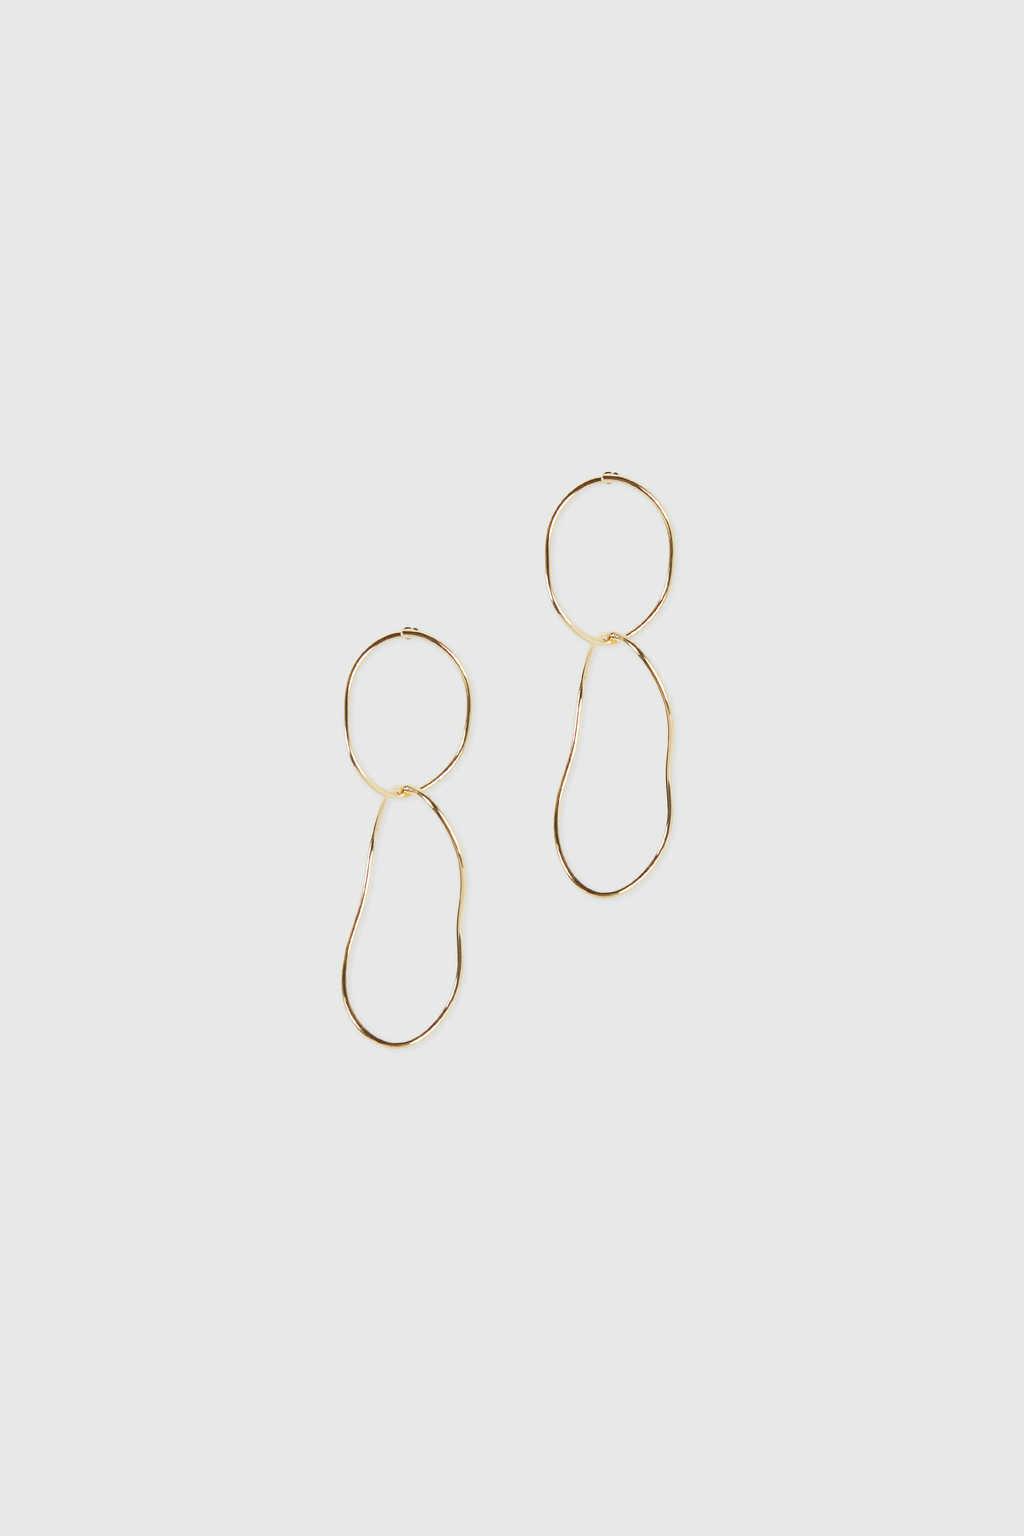 Earring J028 Gold 2